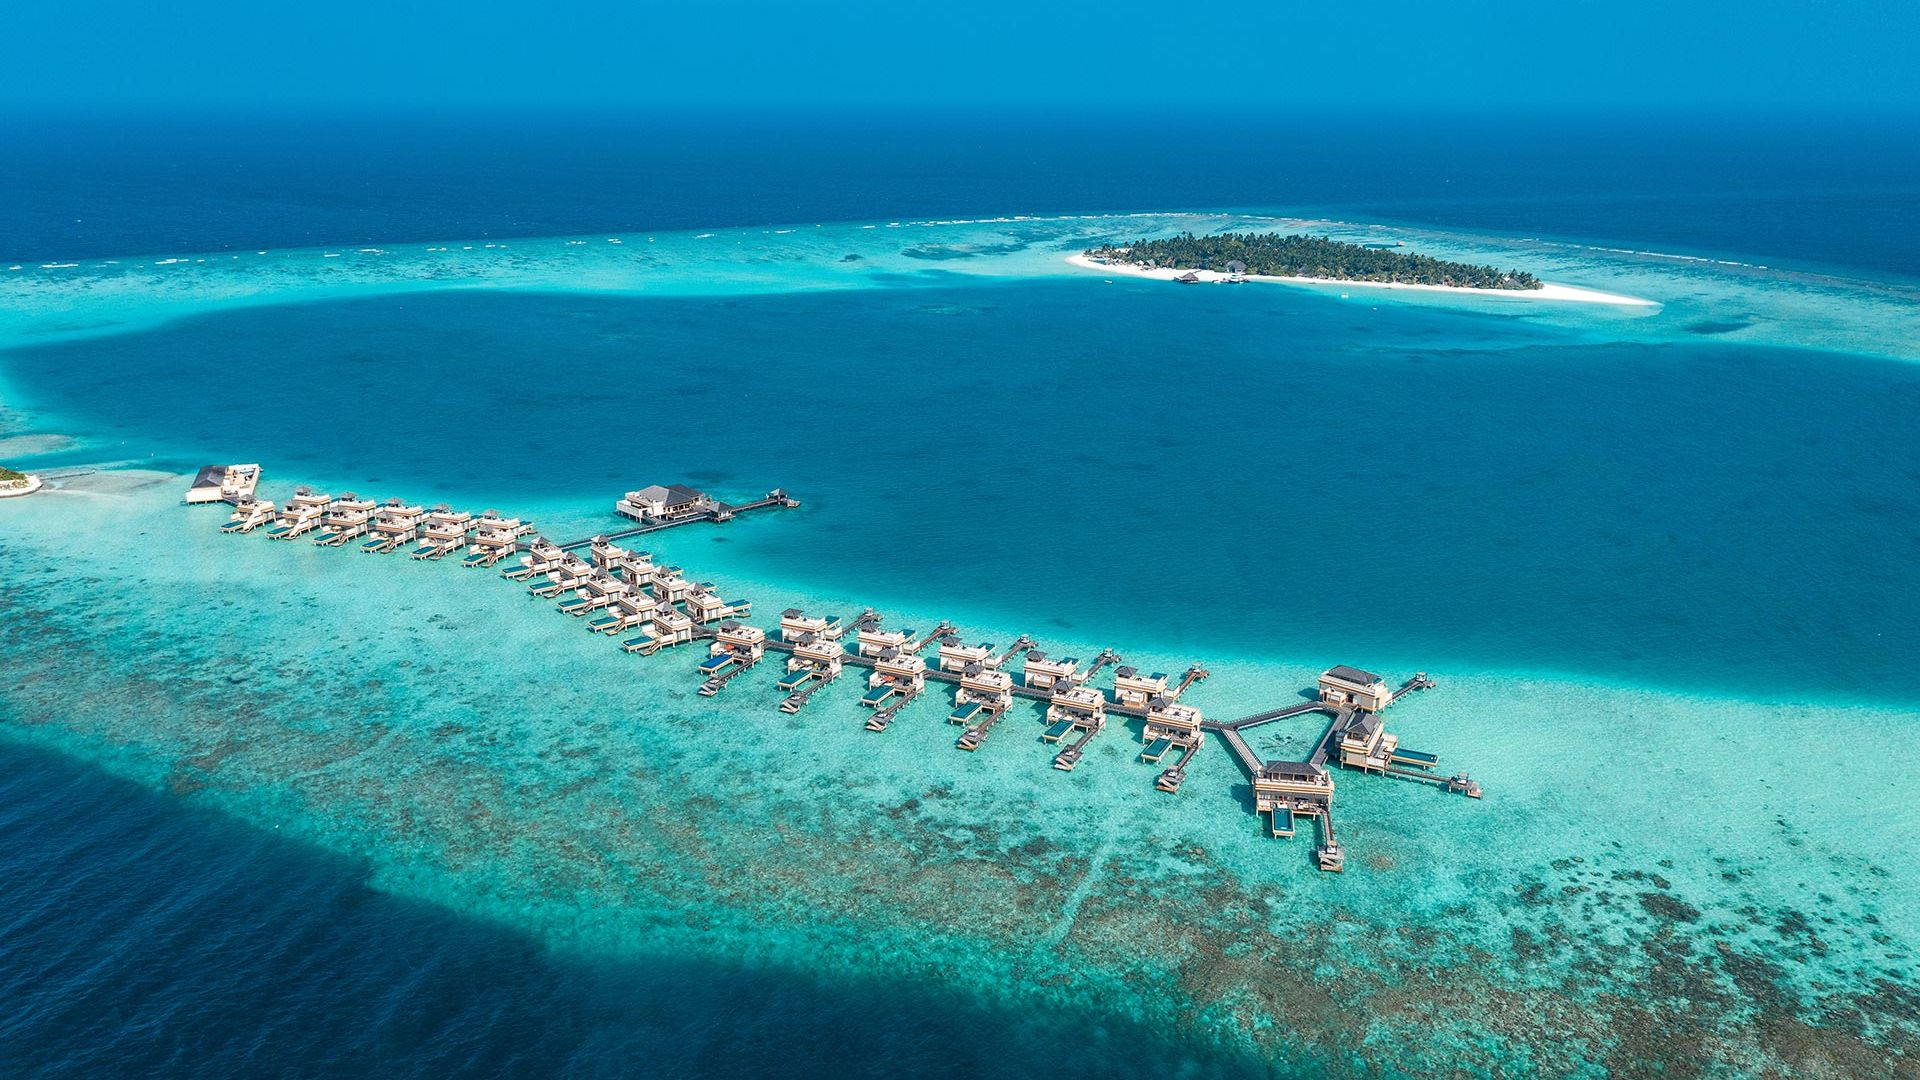 Luna de miere - Sejur plaja Angsana Velavaru Maldive 5*, 10 zile